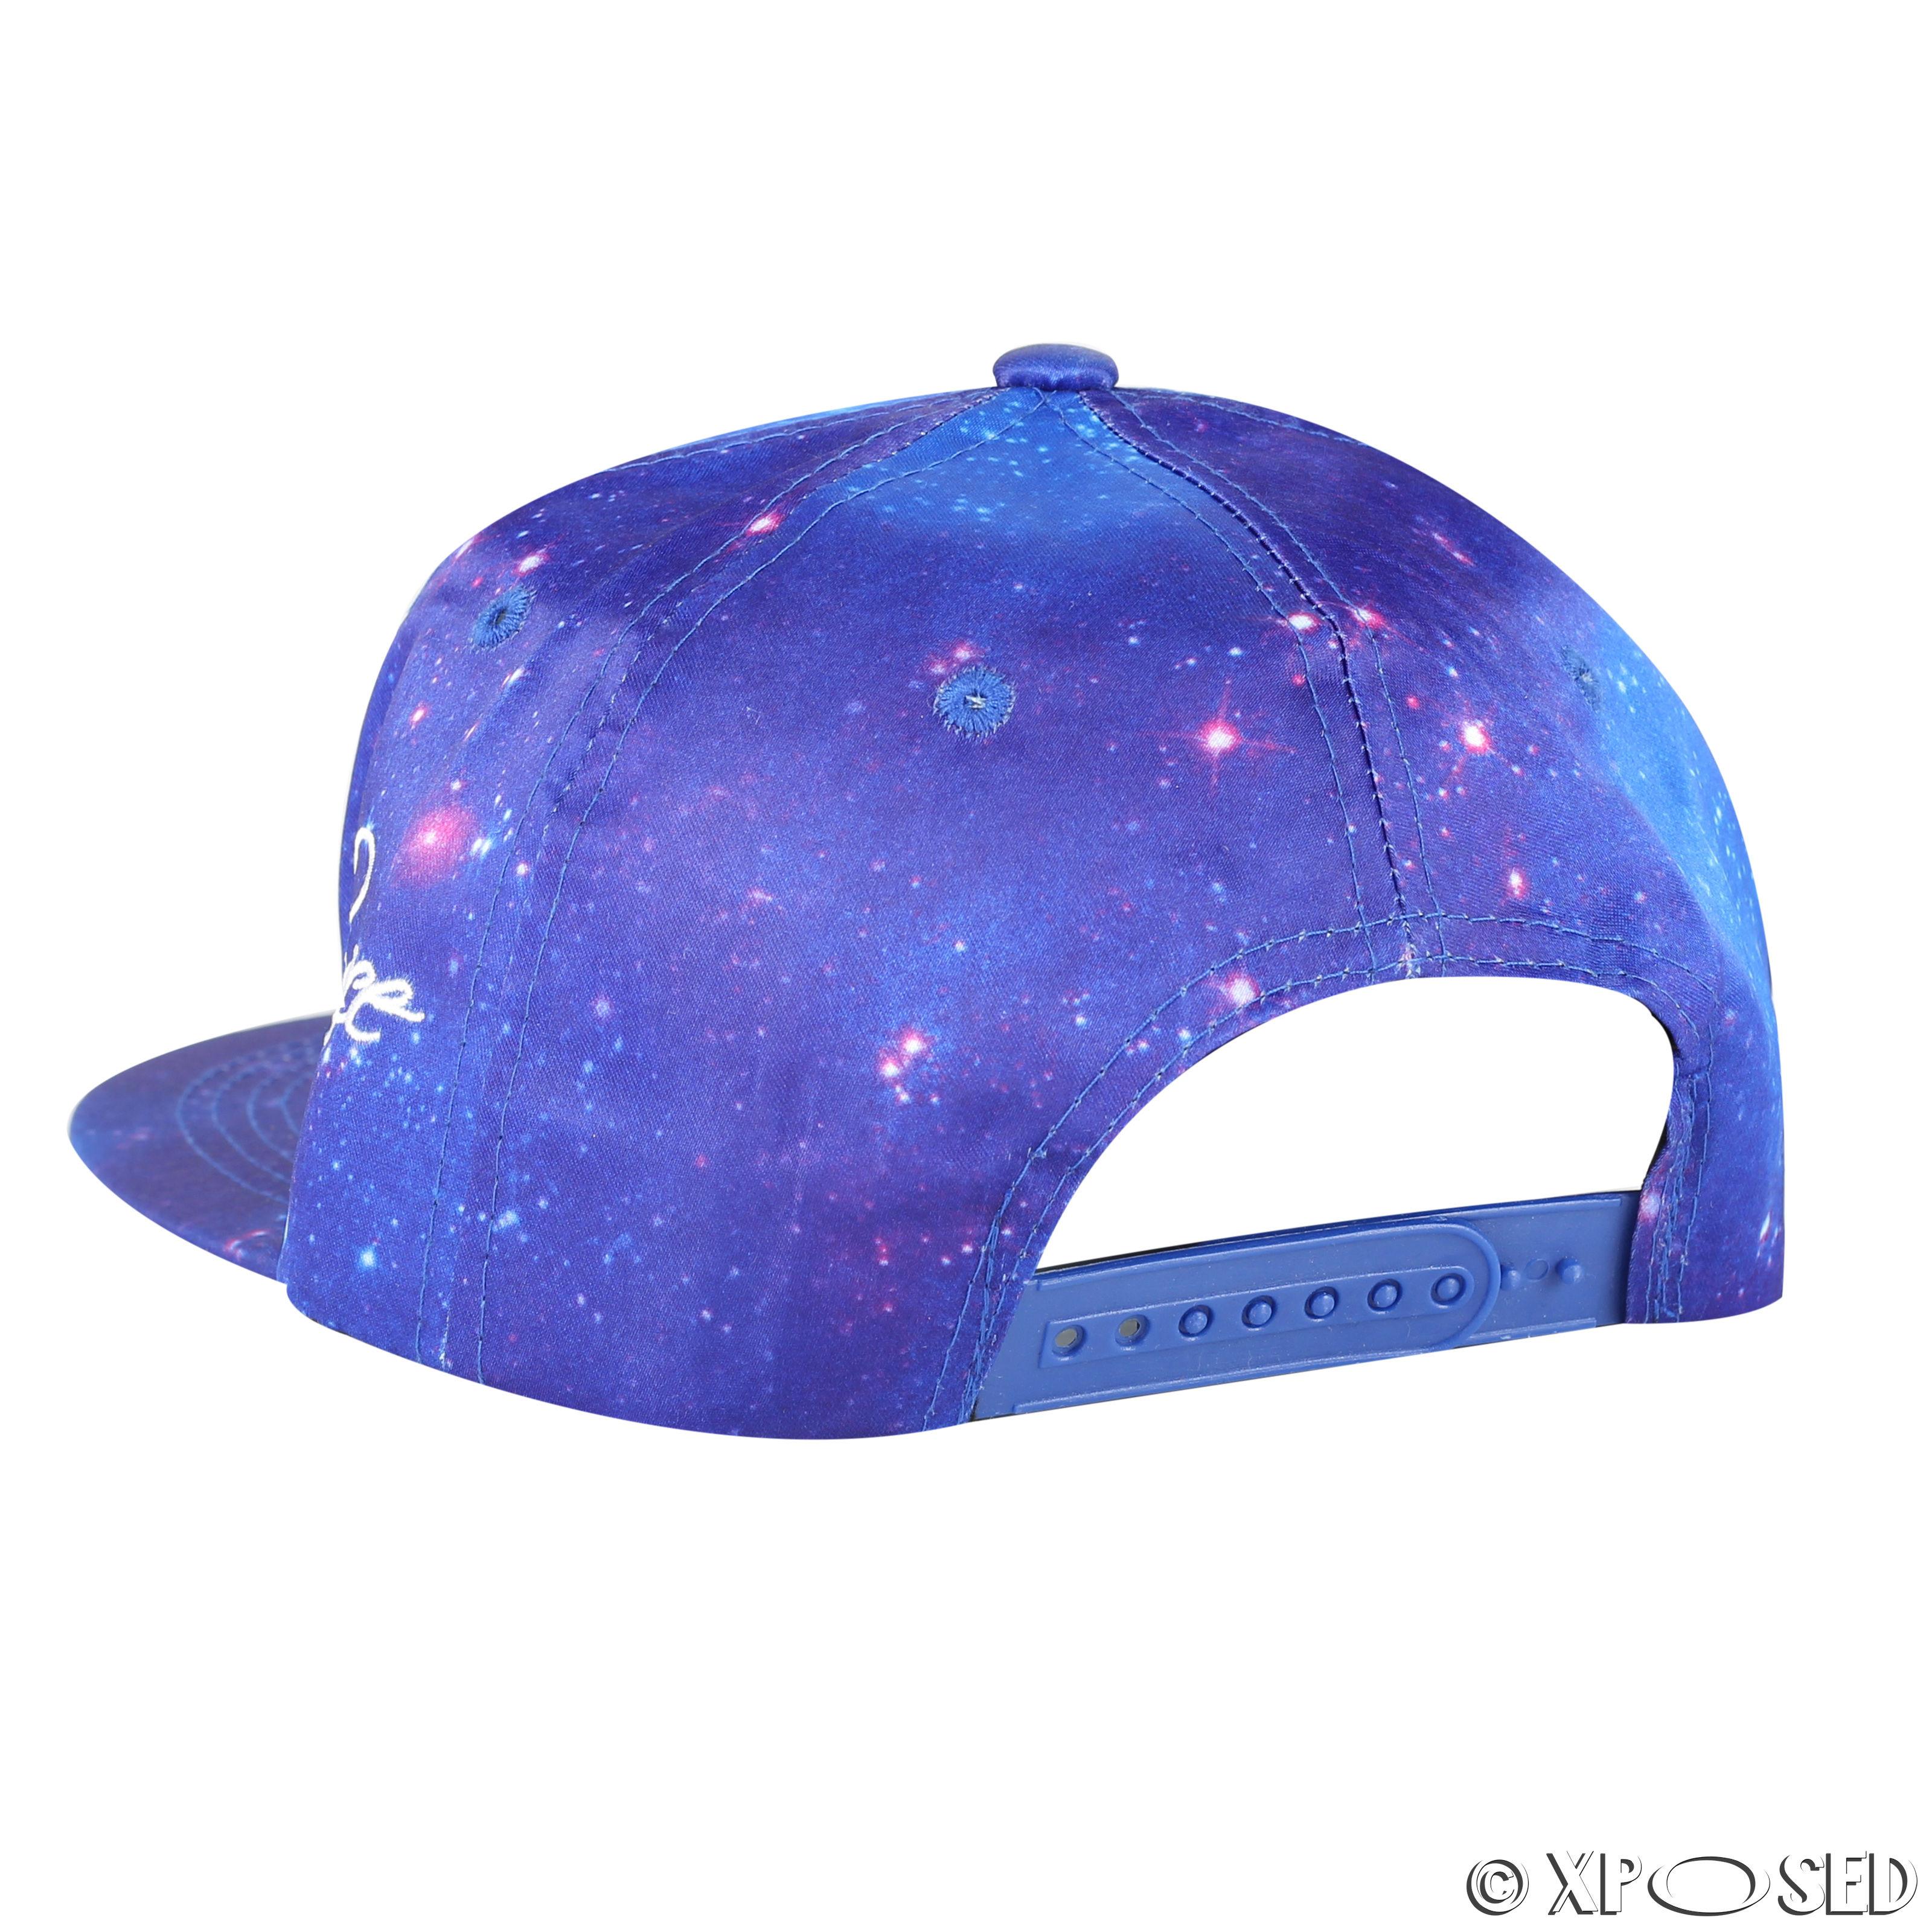 new uk mens womens unisex baseball adjustable snapback hat